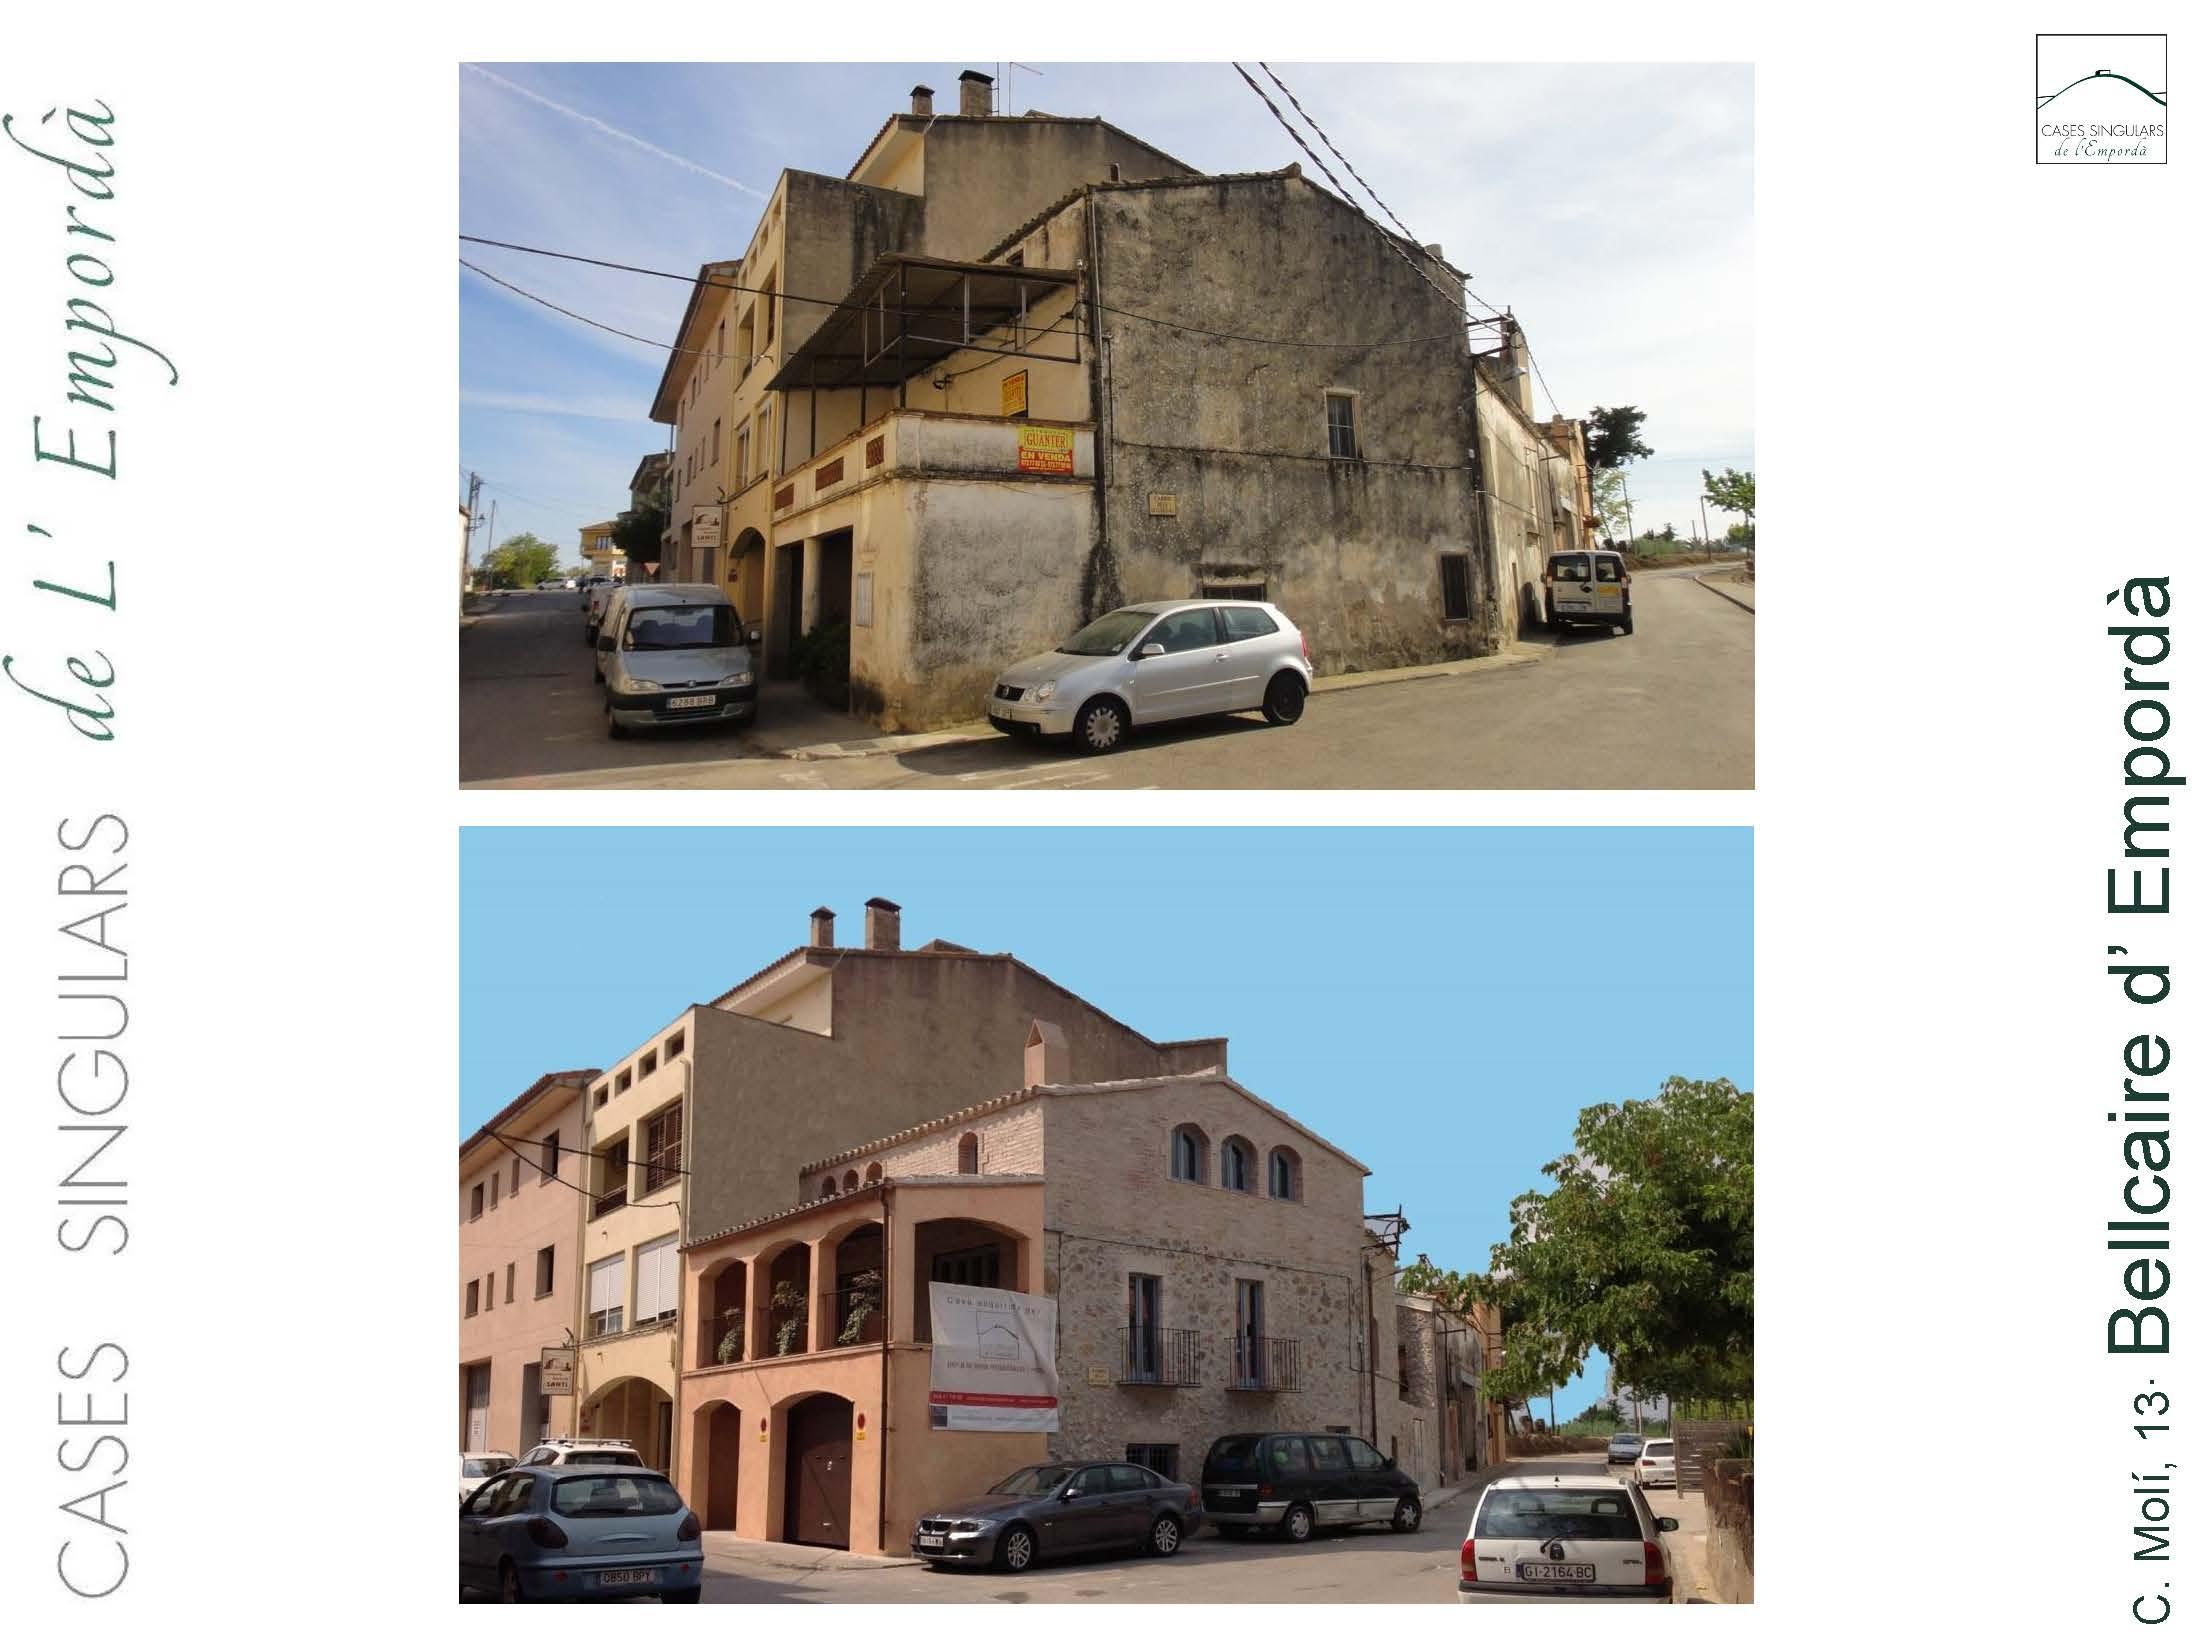 casa_de_pueblo_rehabilitada_en_venta_calle_Moli_13_BELLCAIRE_EMPORDÀ_baix_emporda_girona_cases_singulars